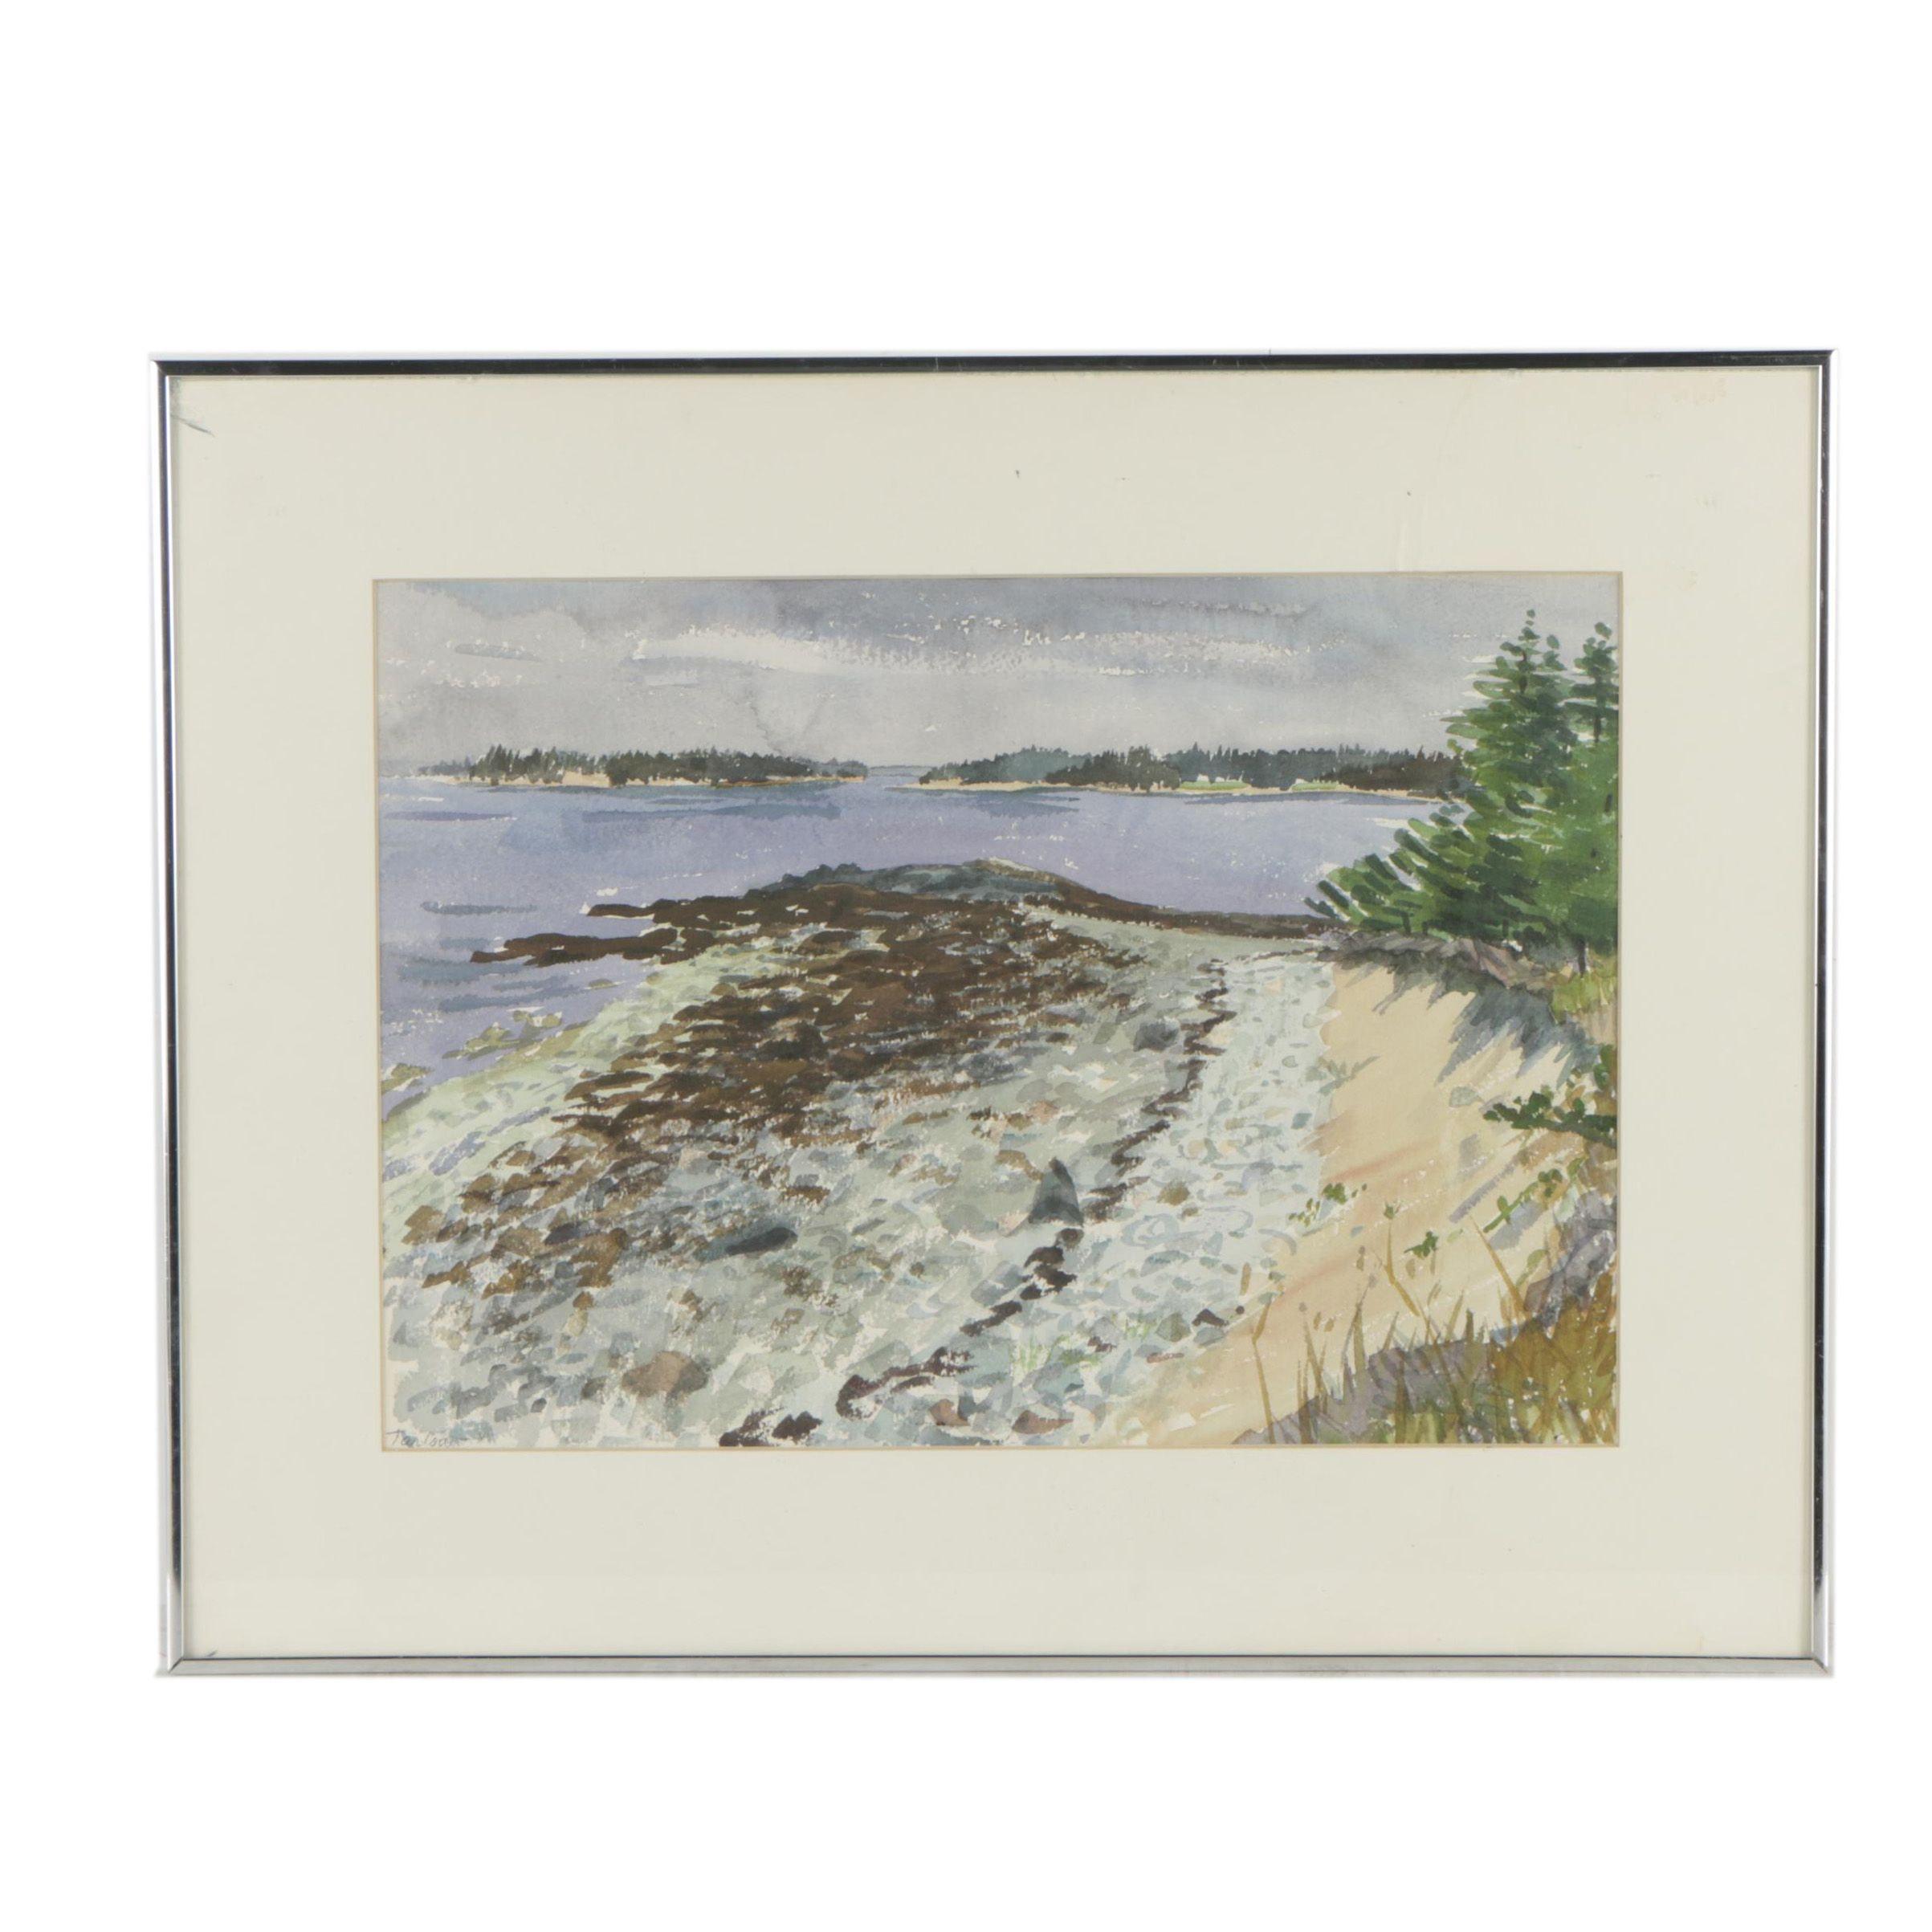 Tarlow Watercolor Painting of a Lake Shore